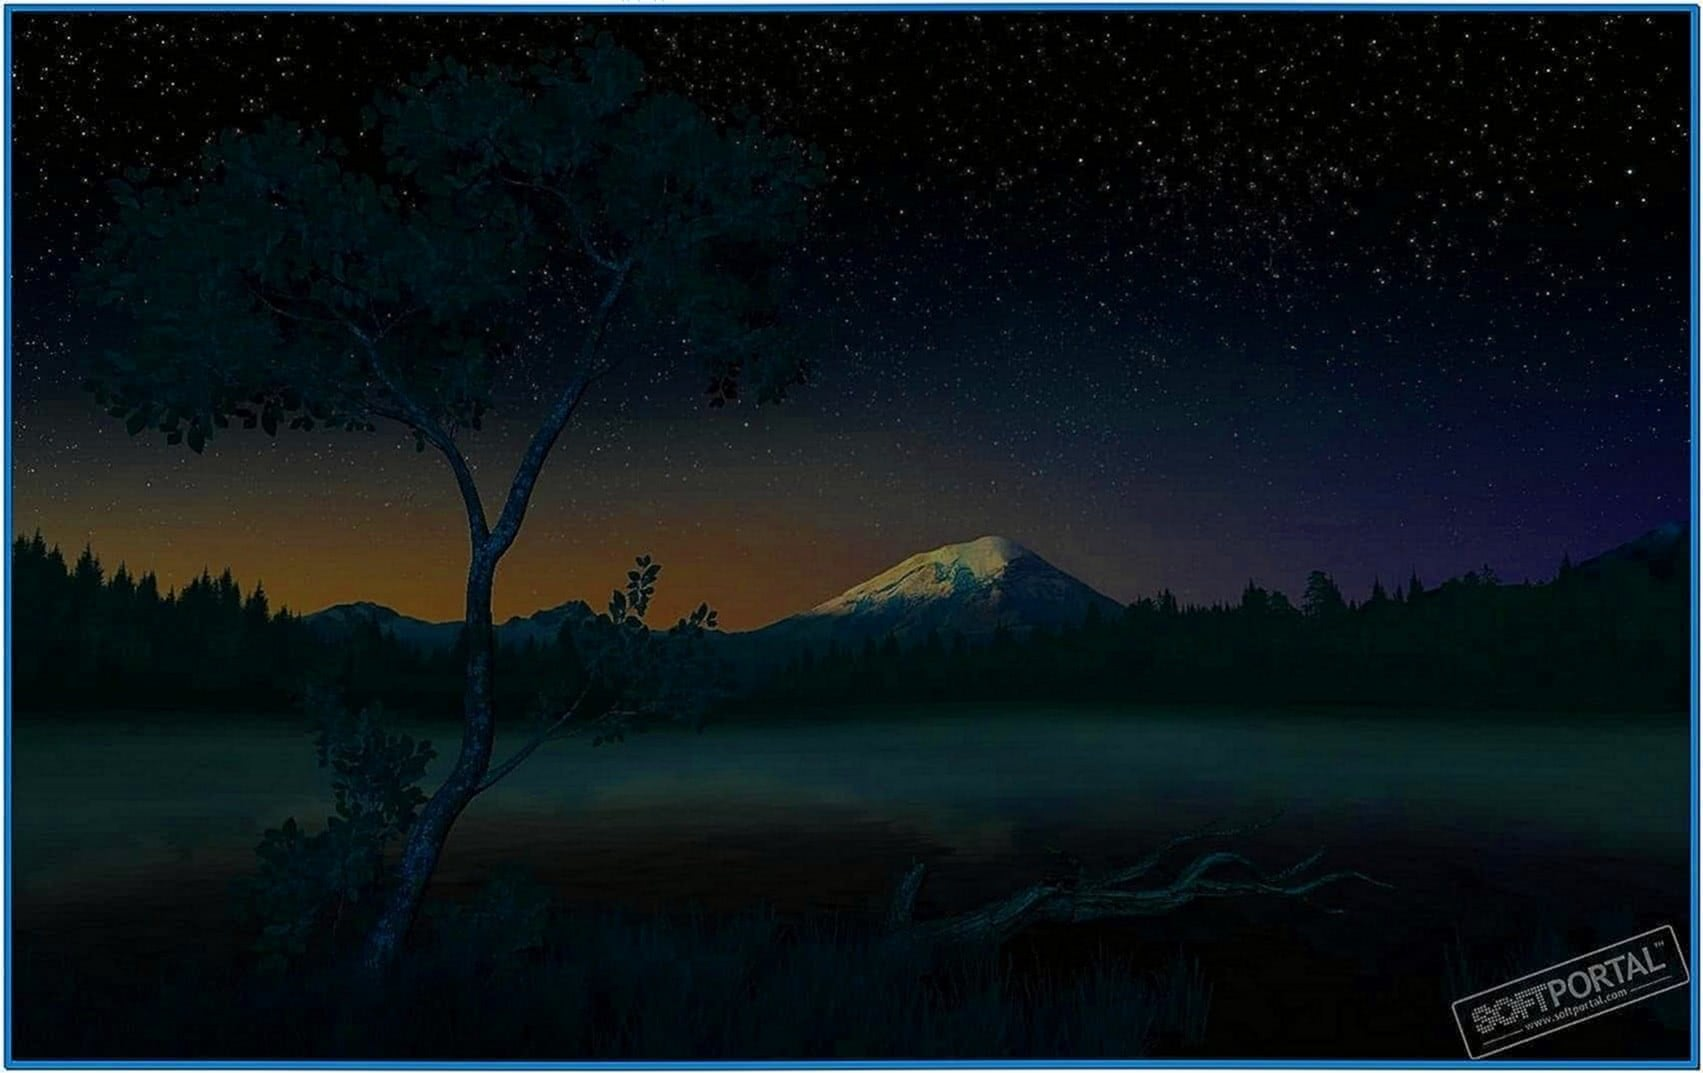 Starry night 3D screensaver